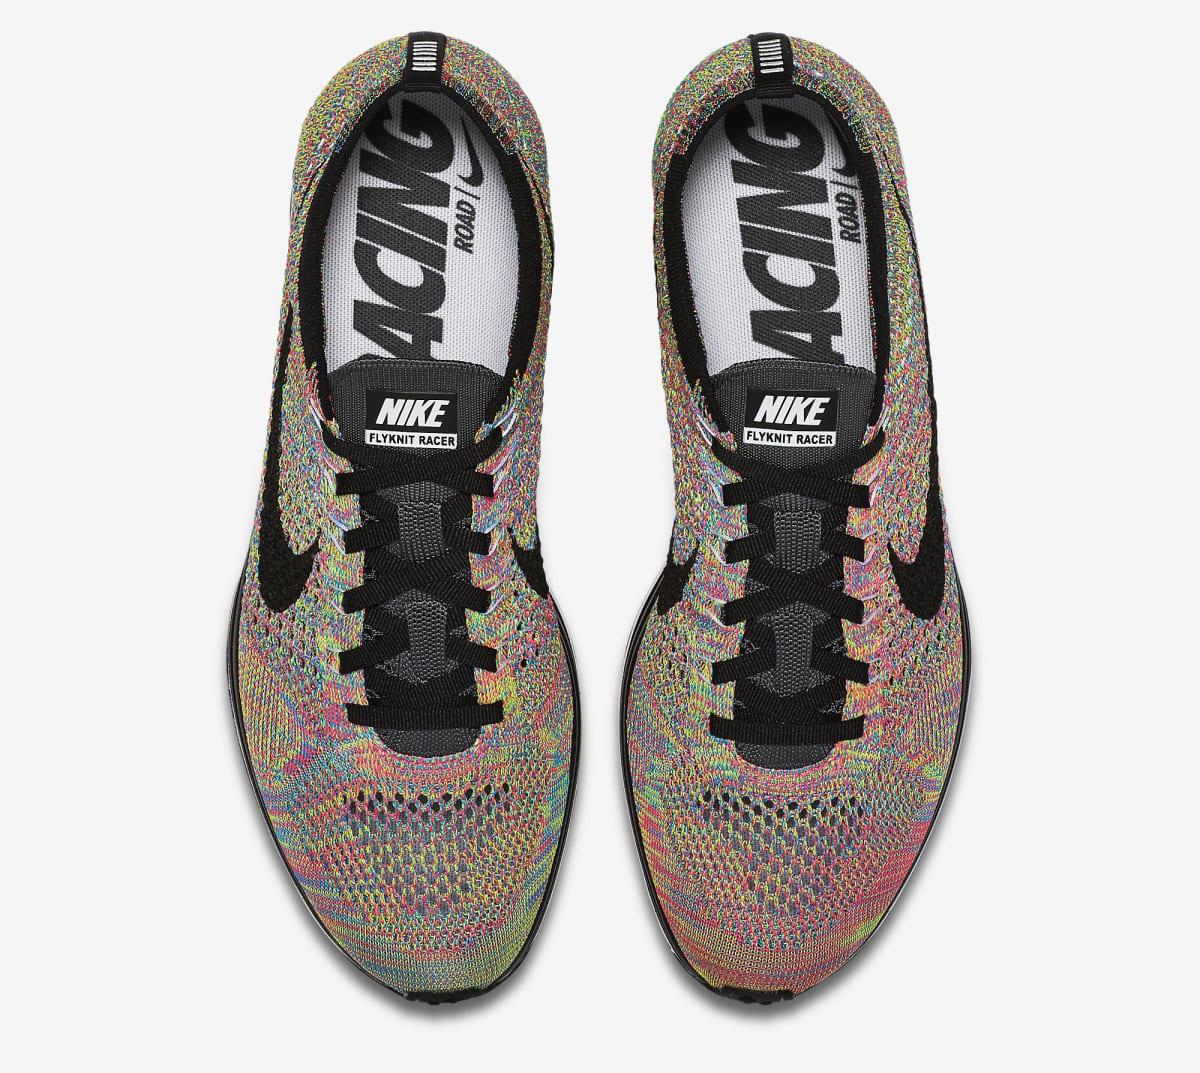 70ac1b039ffb Nike Flyknit Racer Multicolor Grey Tongue